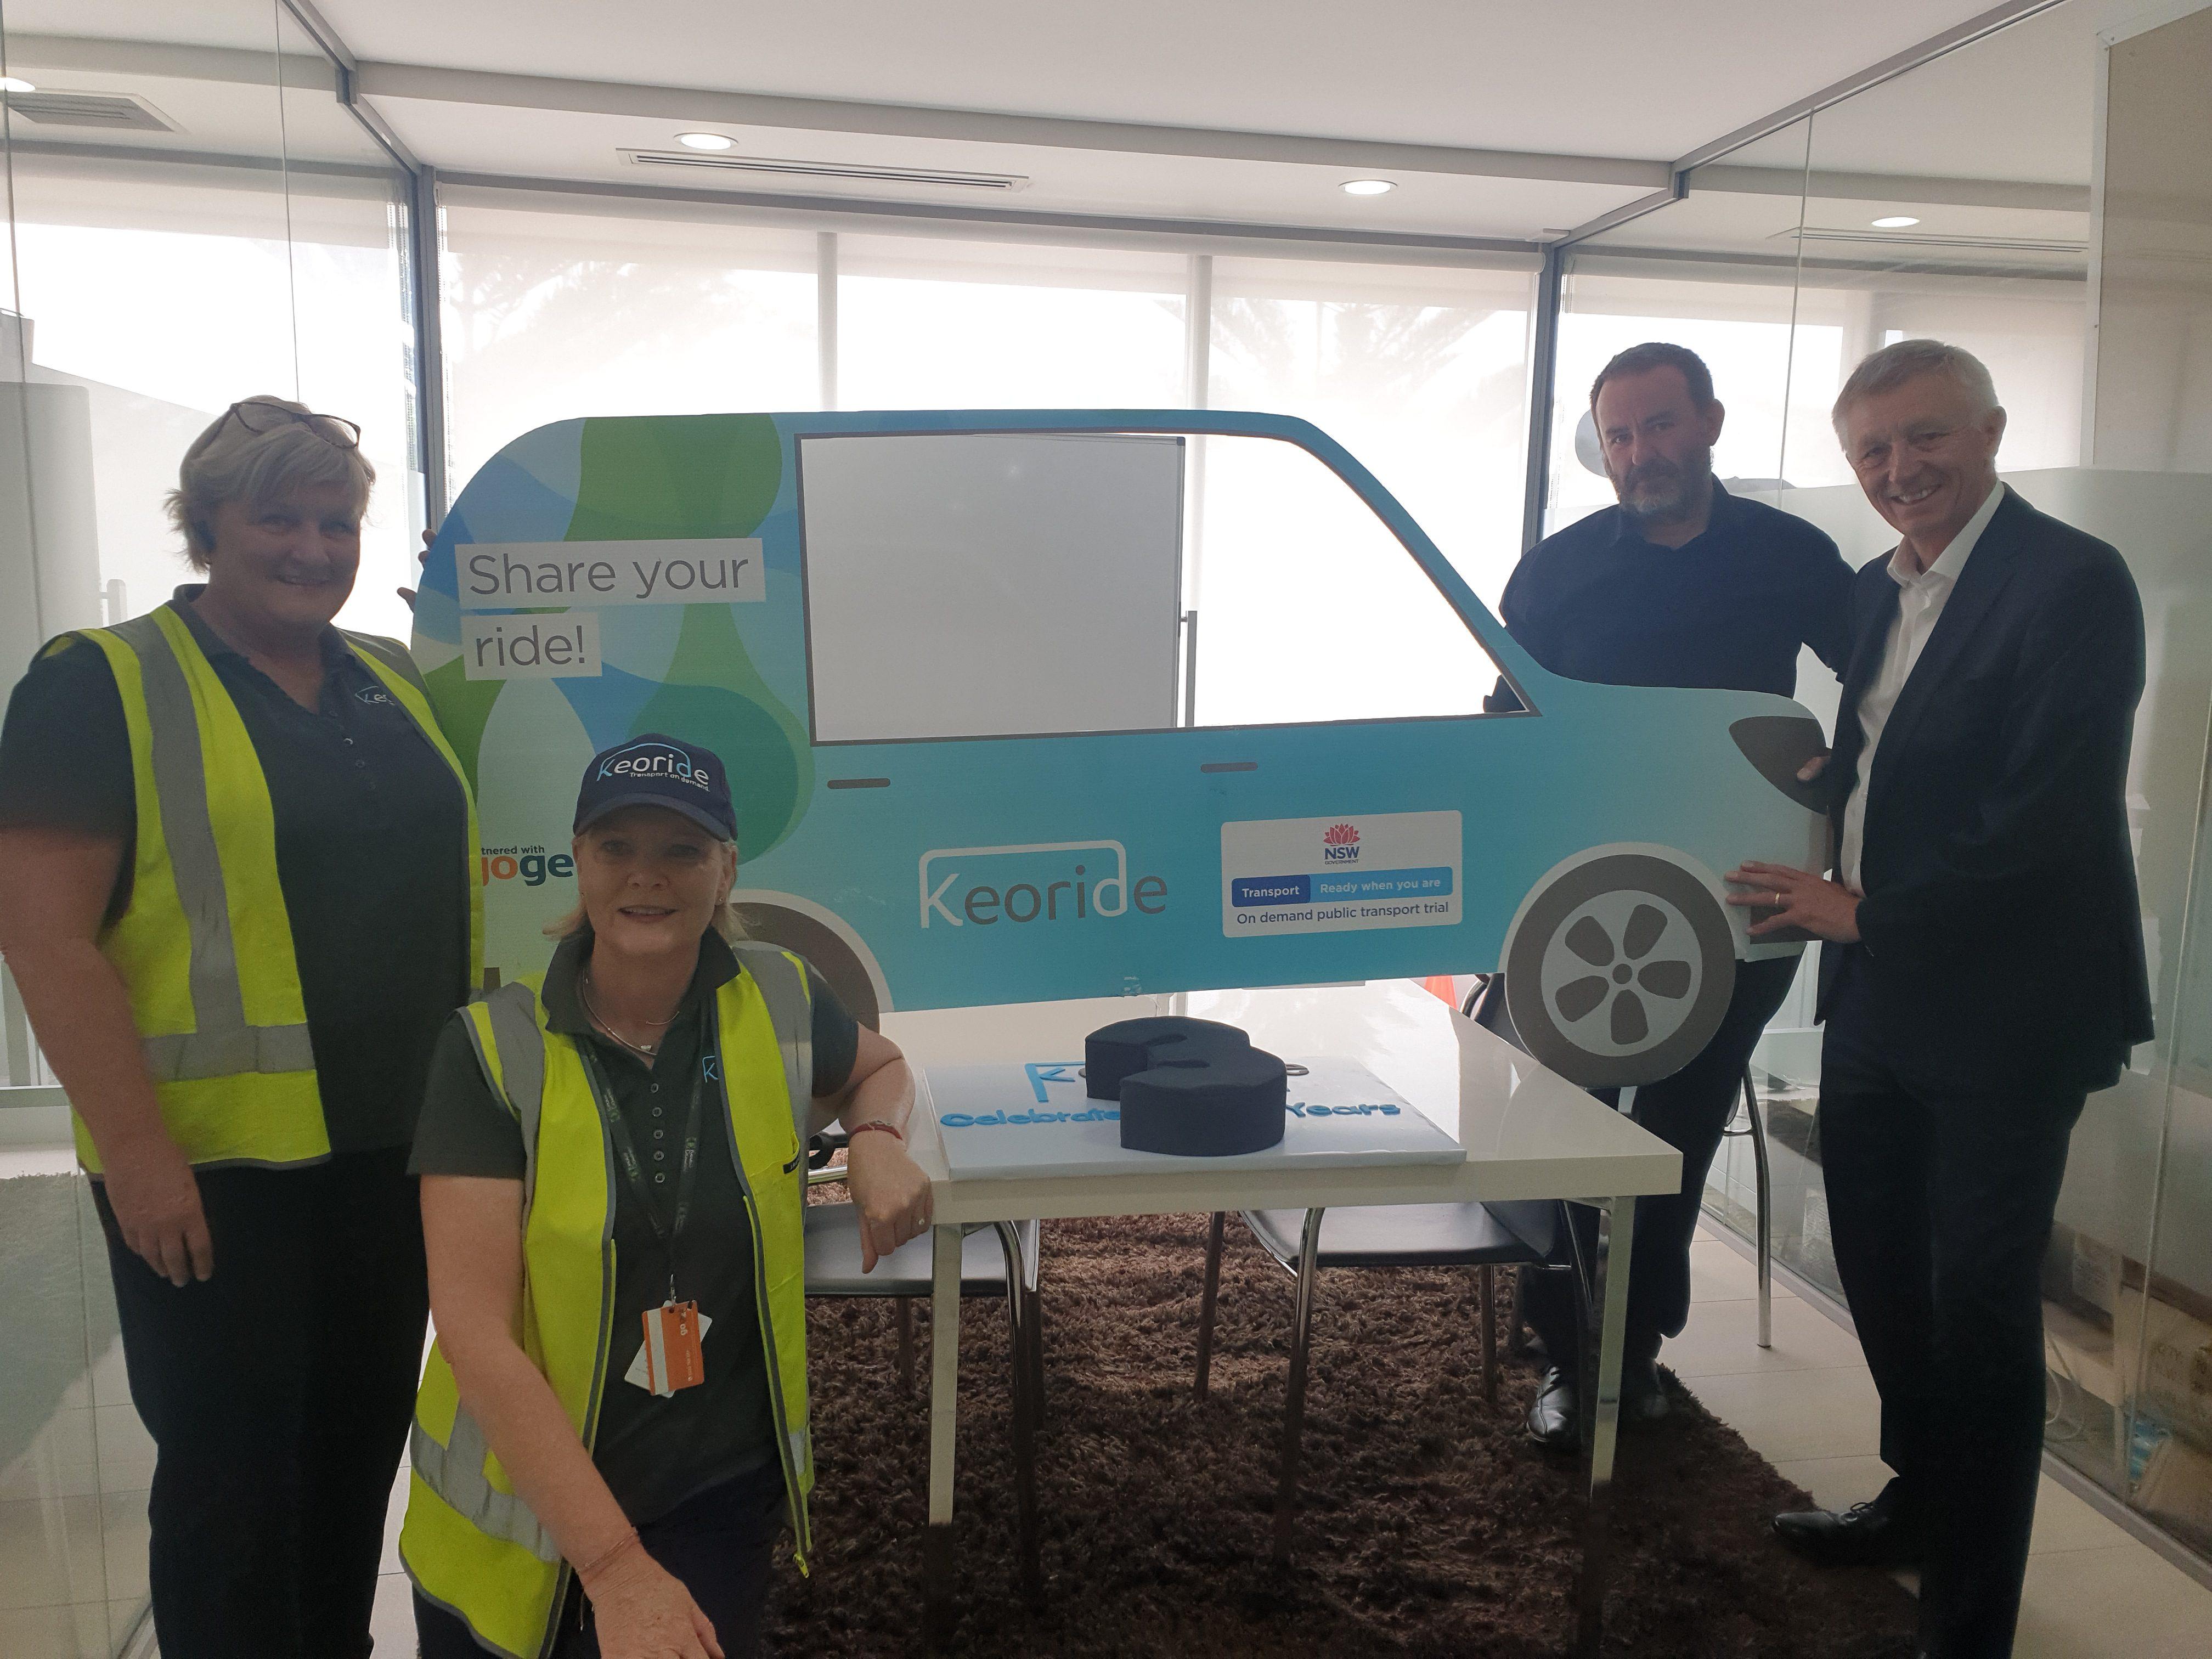 The Northern Beaches On Demand transport service Keoride reaches 3 year milestone